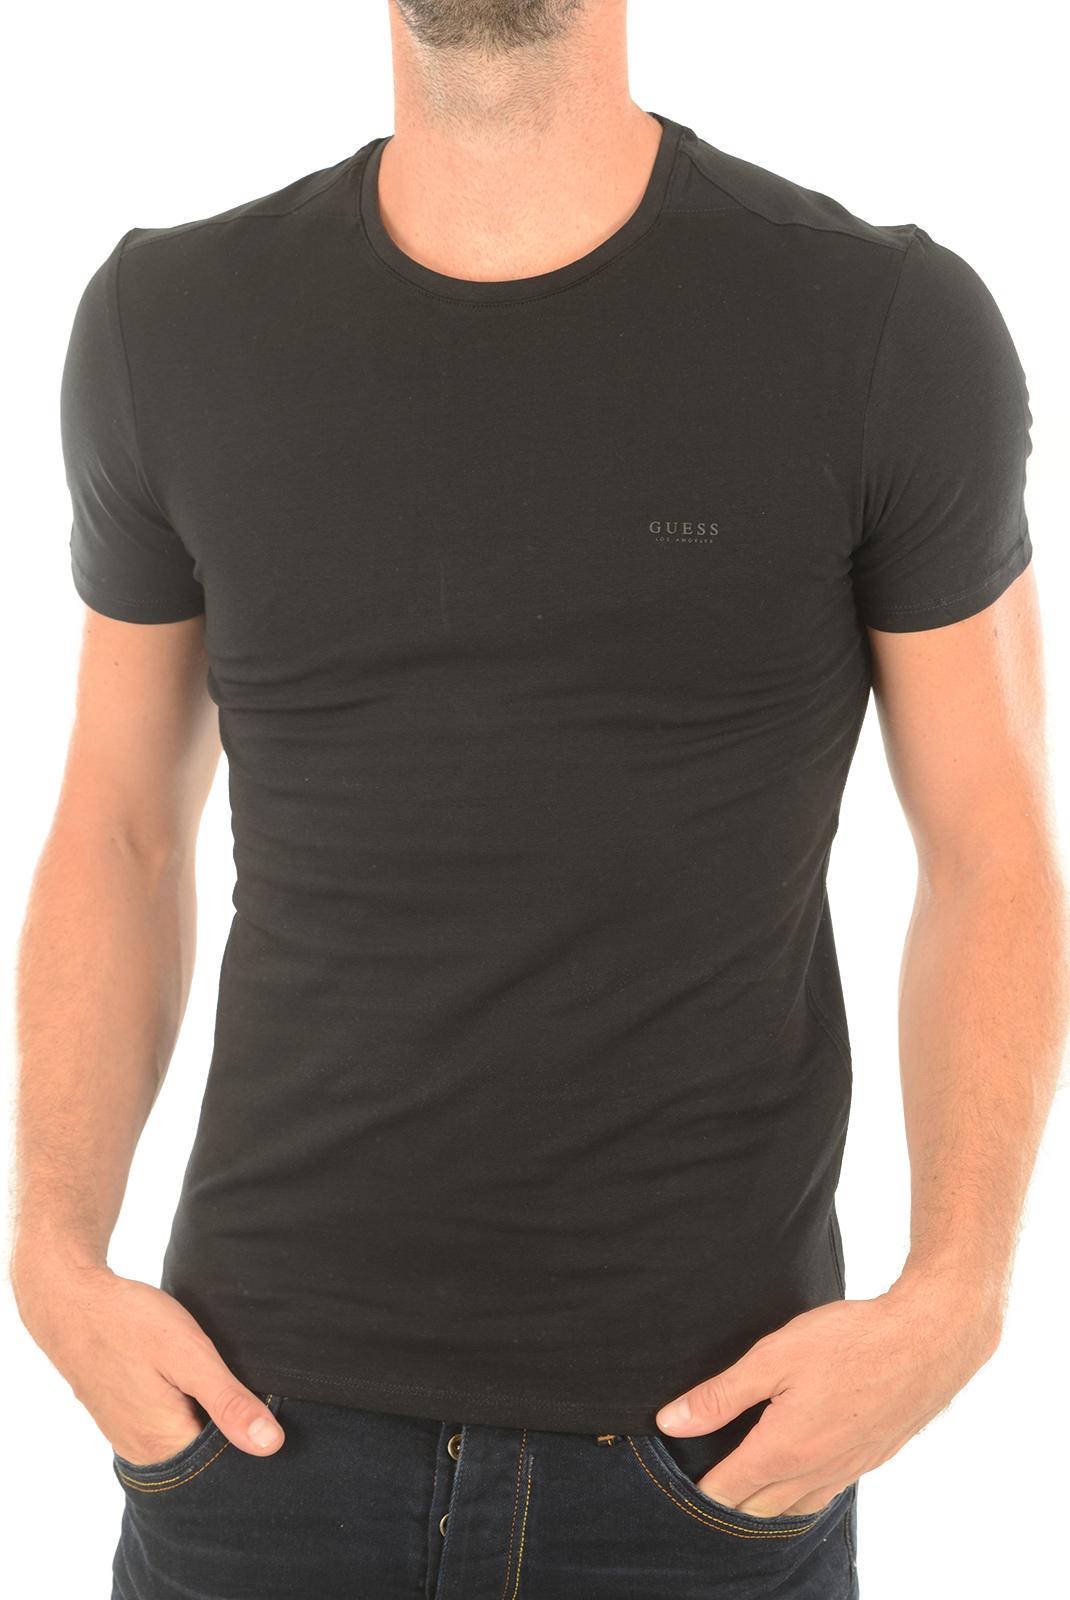 Tee-shirts  Guess jeans M73I56 J1300 A996 NOIR